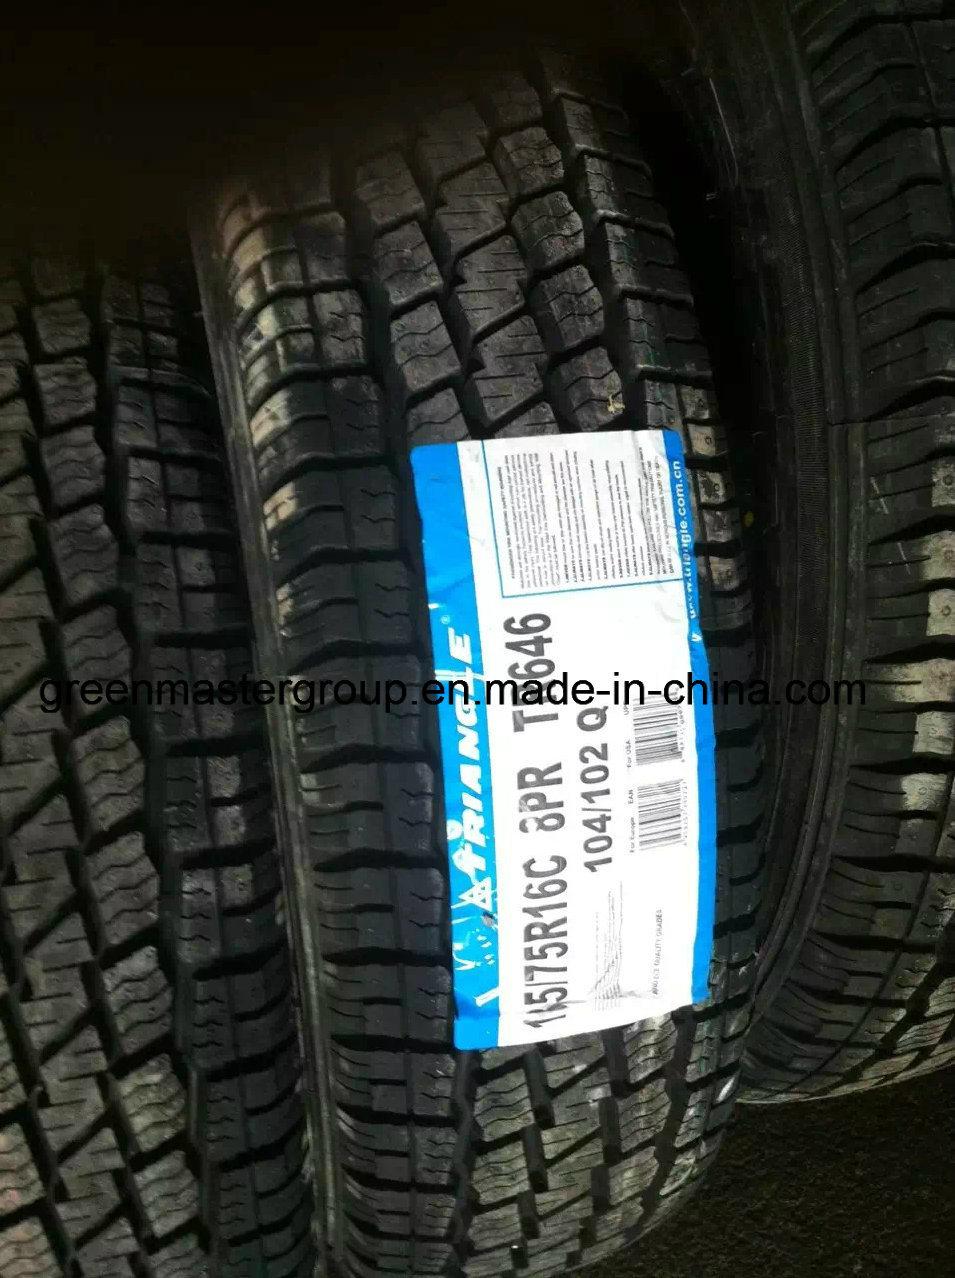 185/75r16c 175/75r16c Tr646 M+S Radial Car Tire for Van Tyre